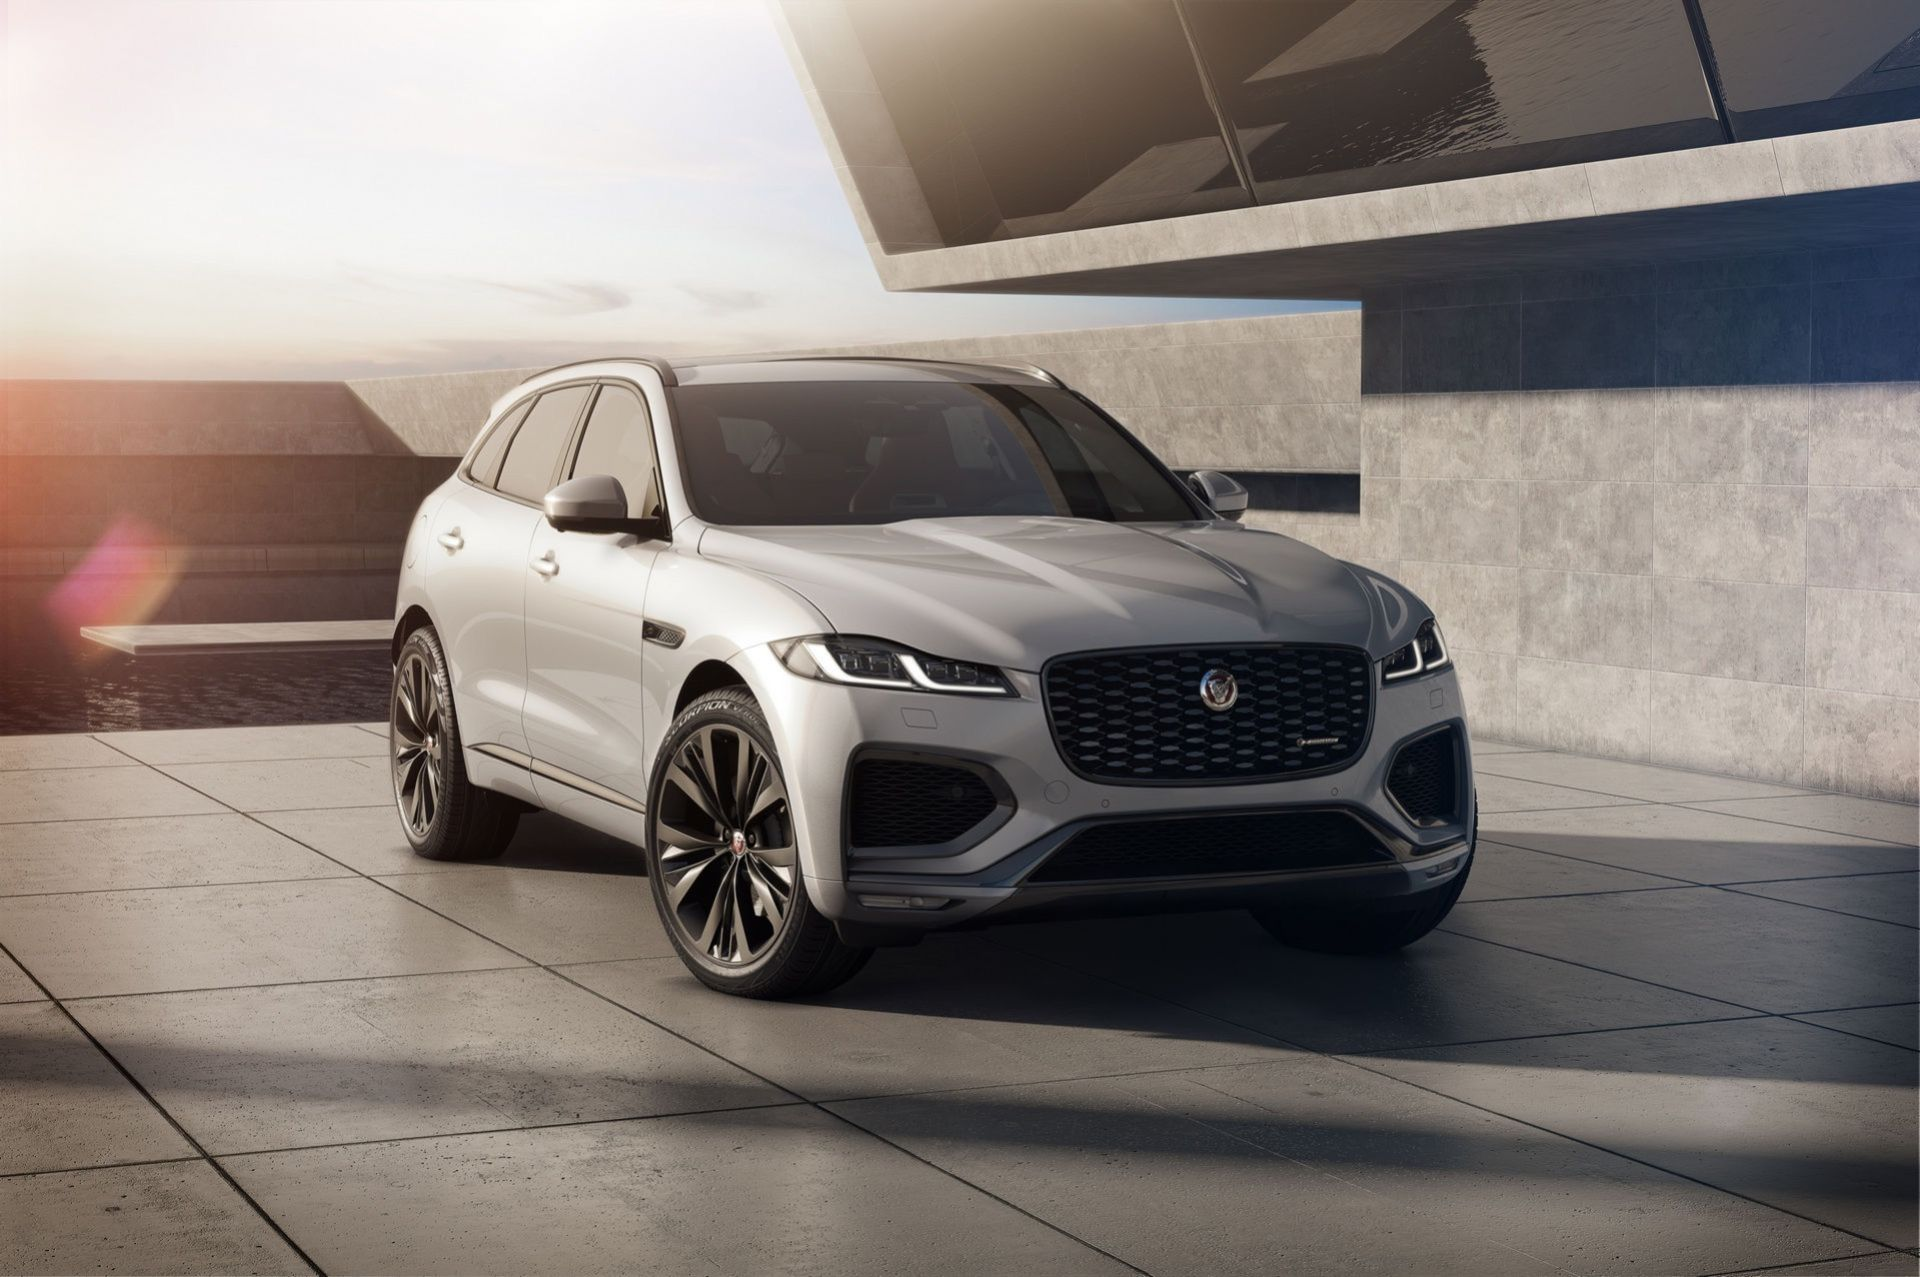 Jaguar lyfter F-Pace